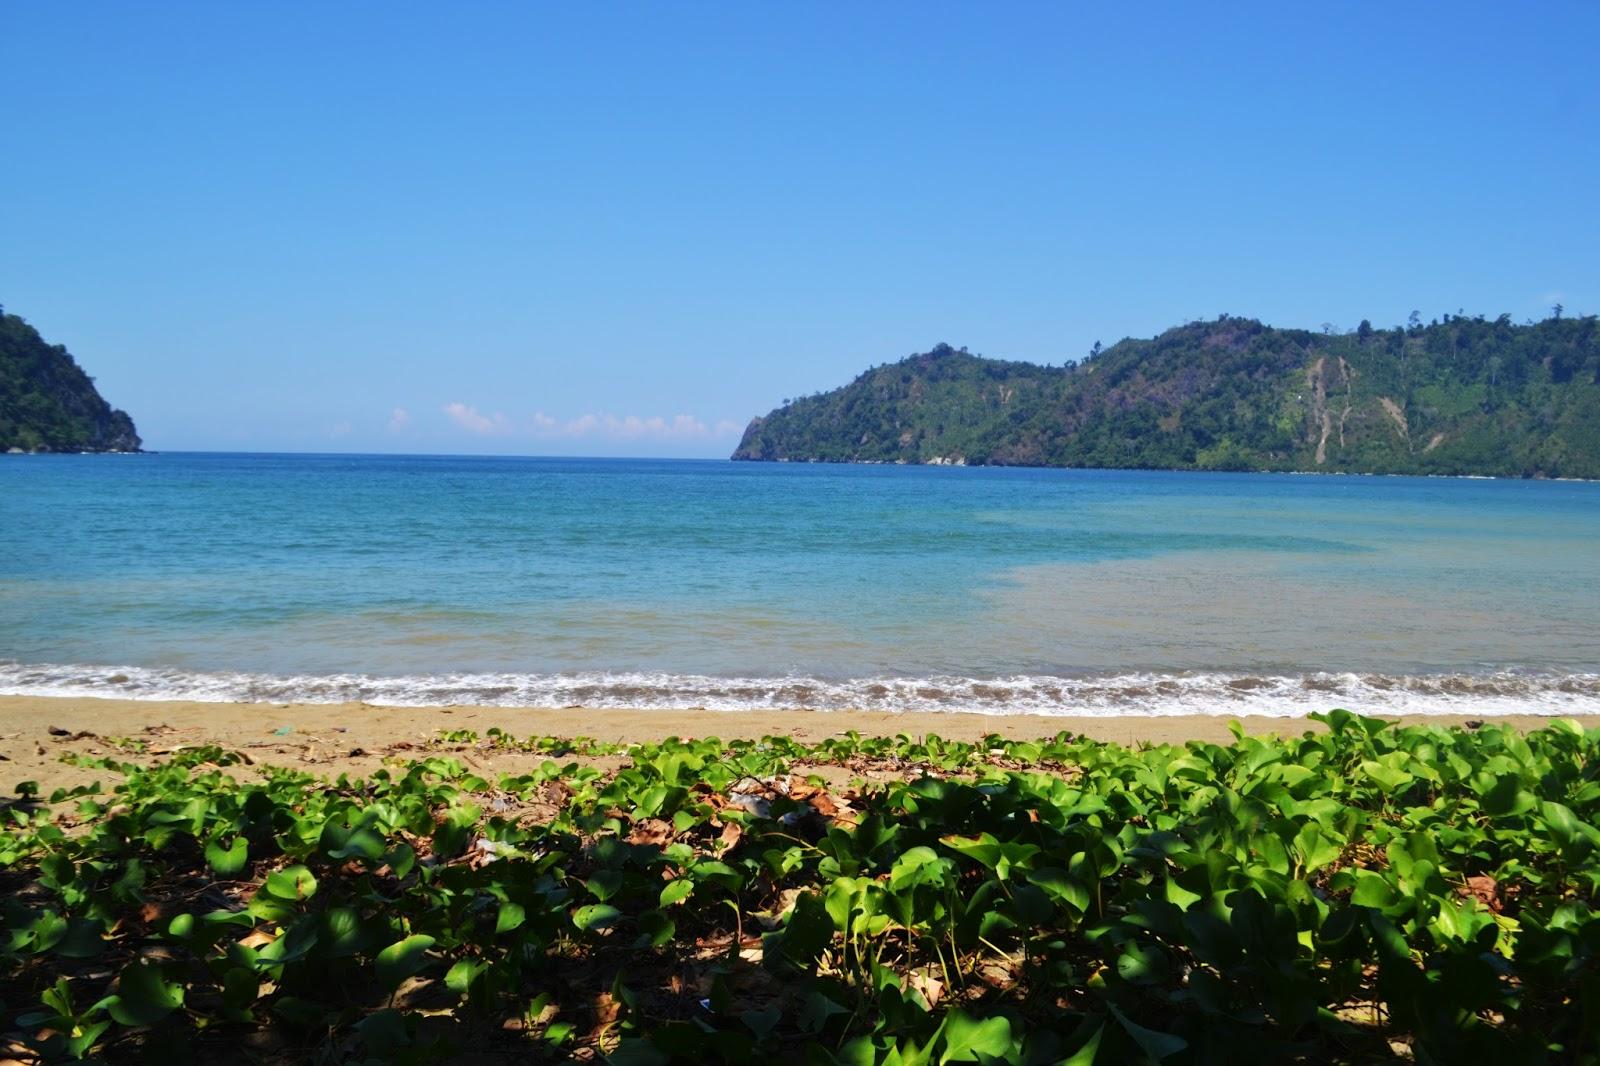 Pantai Sipelot Whiempy Coban Kab Malang